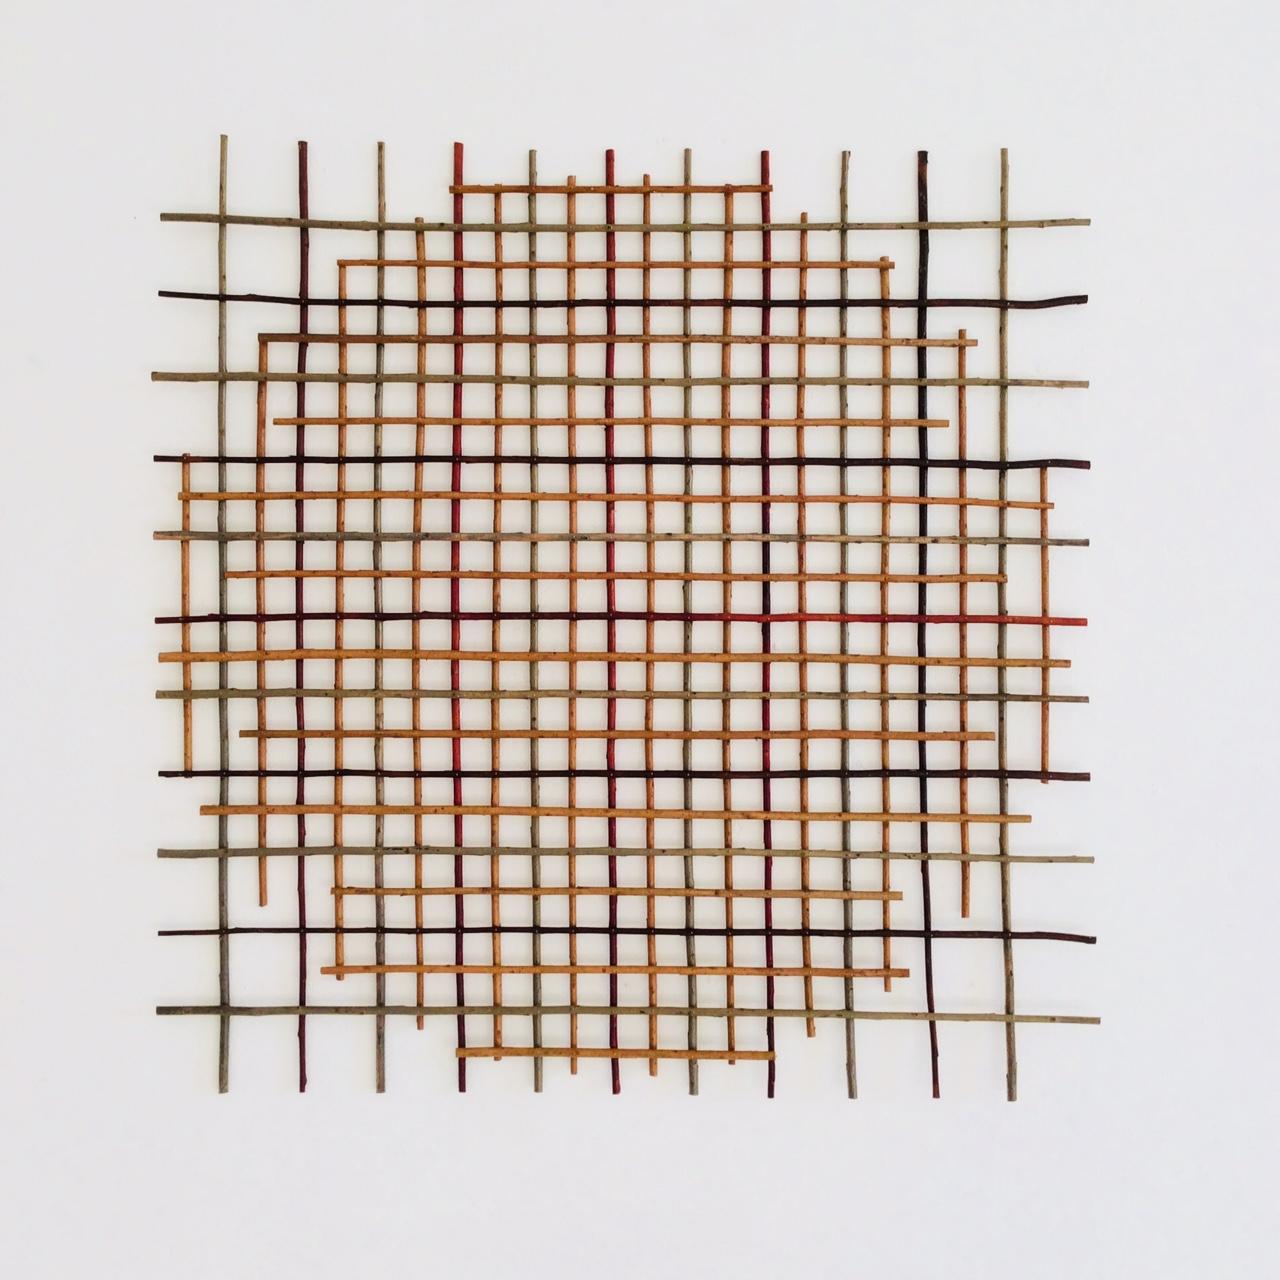 Grid piece I